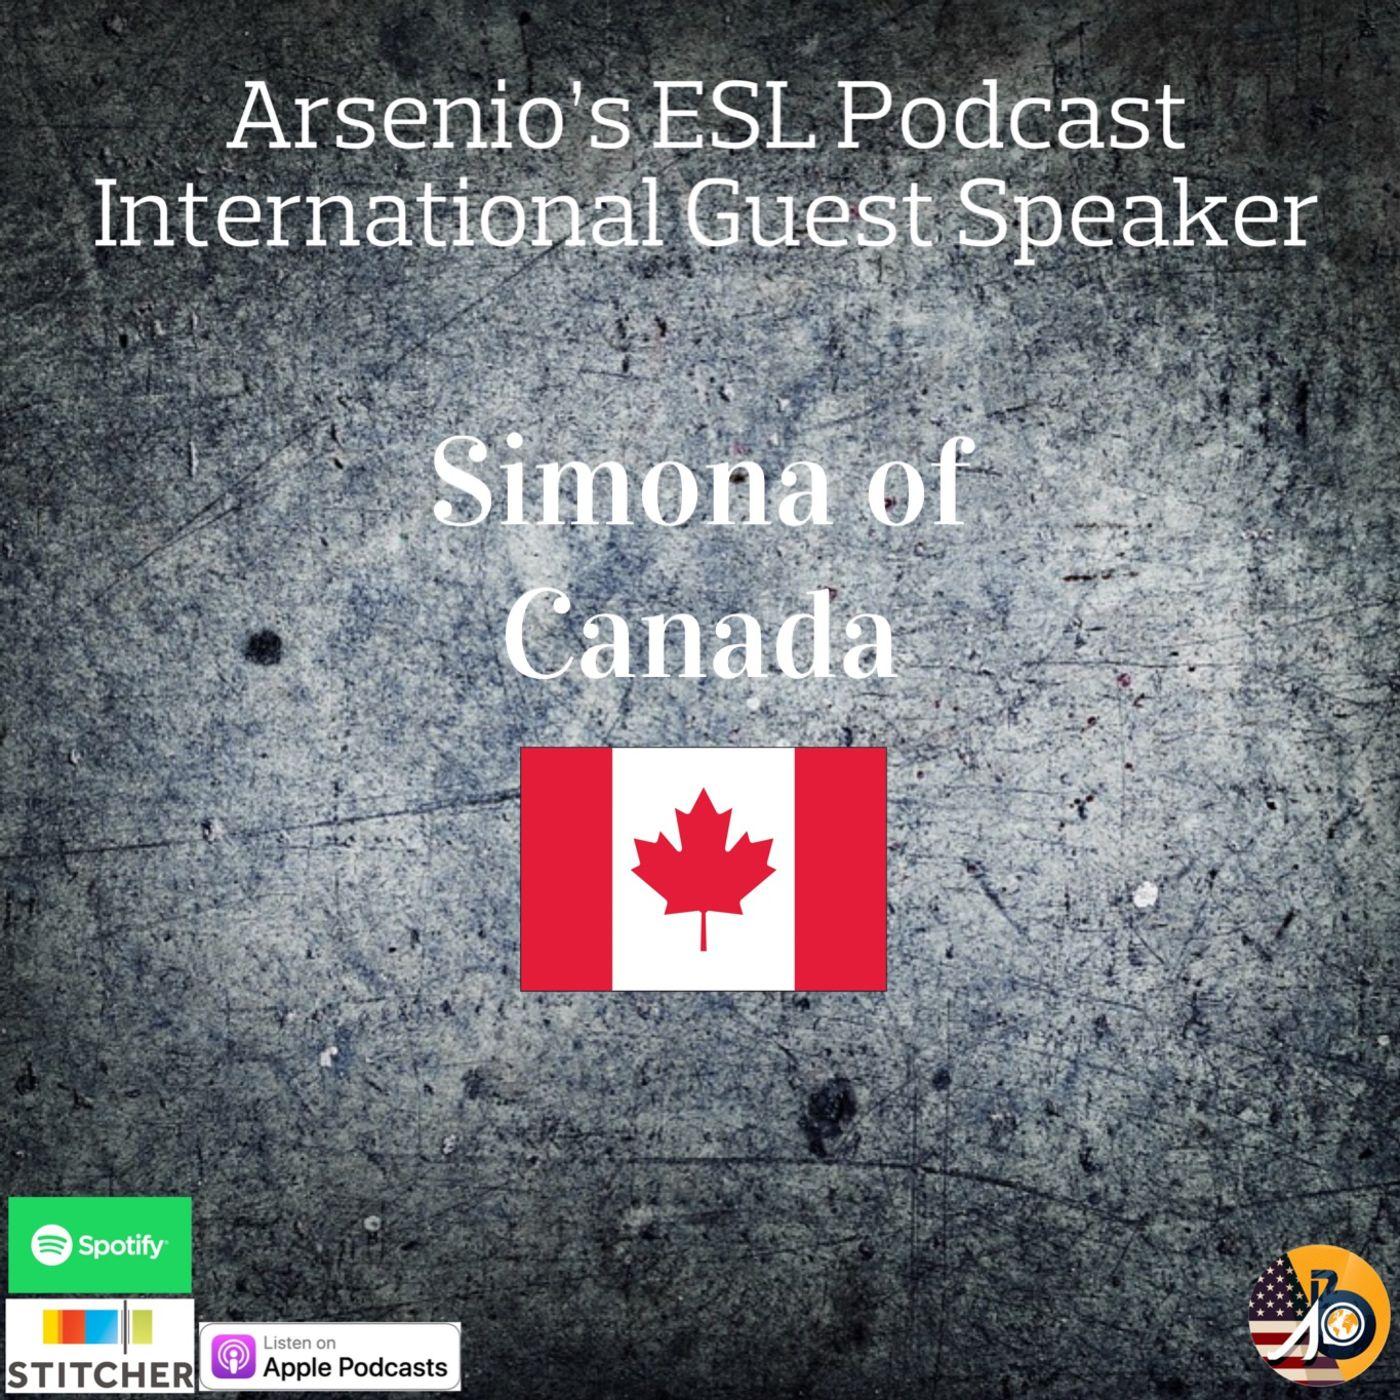 Arsenio's ESL Podcast: International Guest Speaker - Simona of Canada